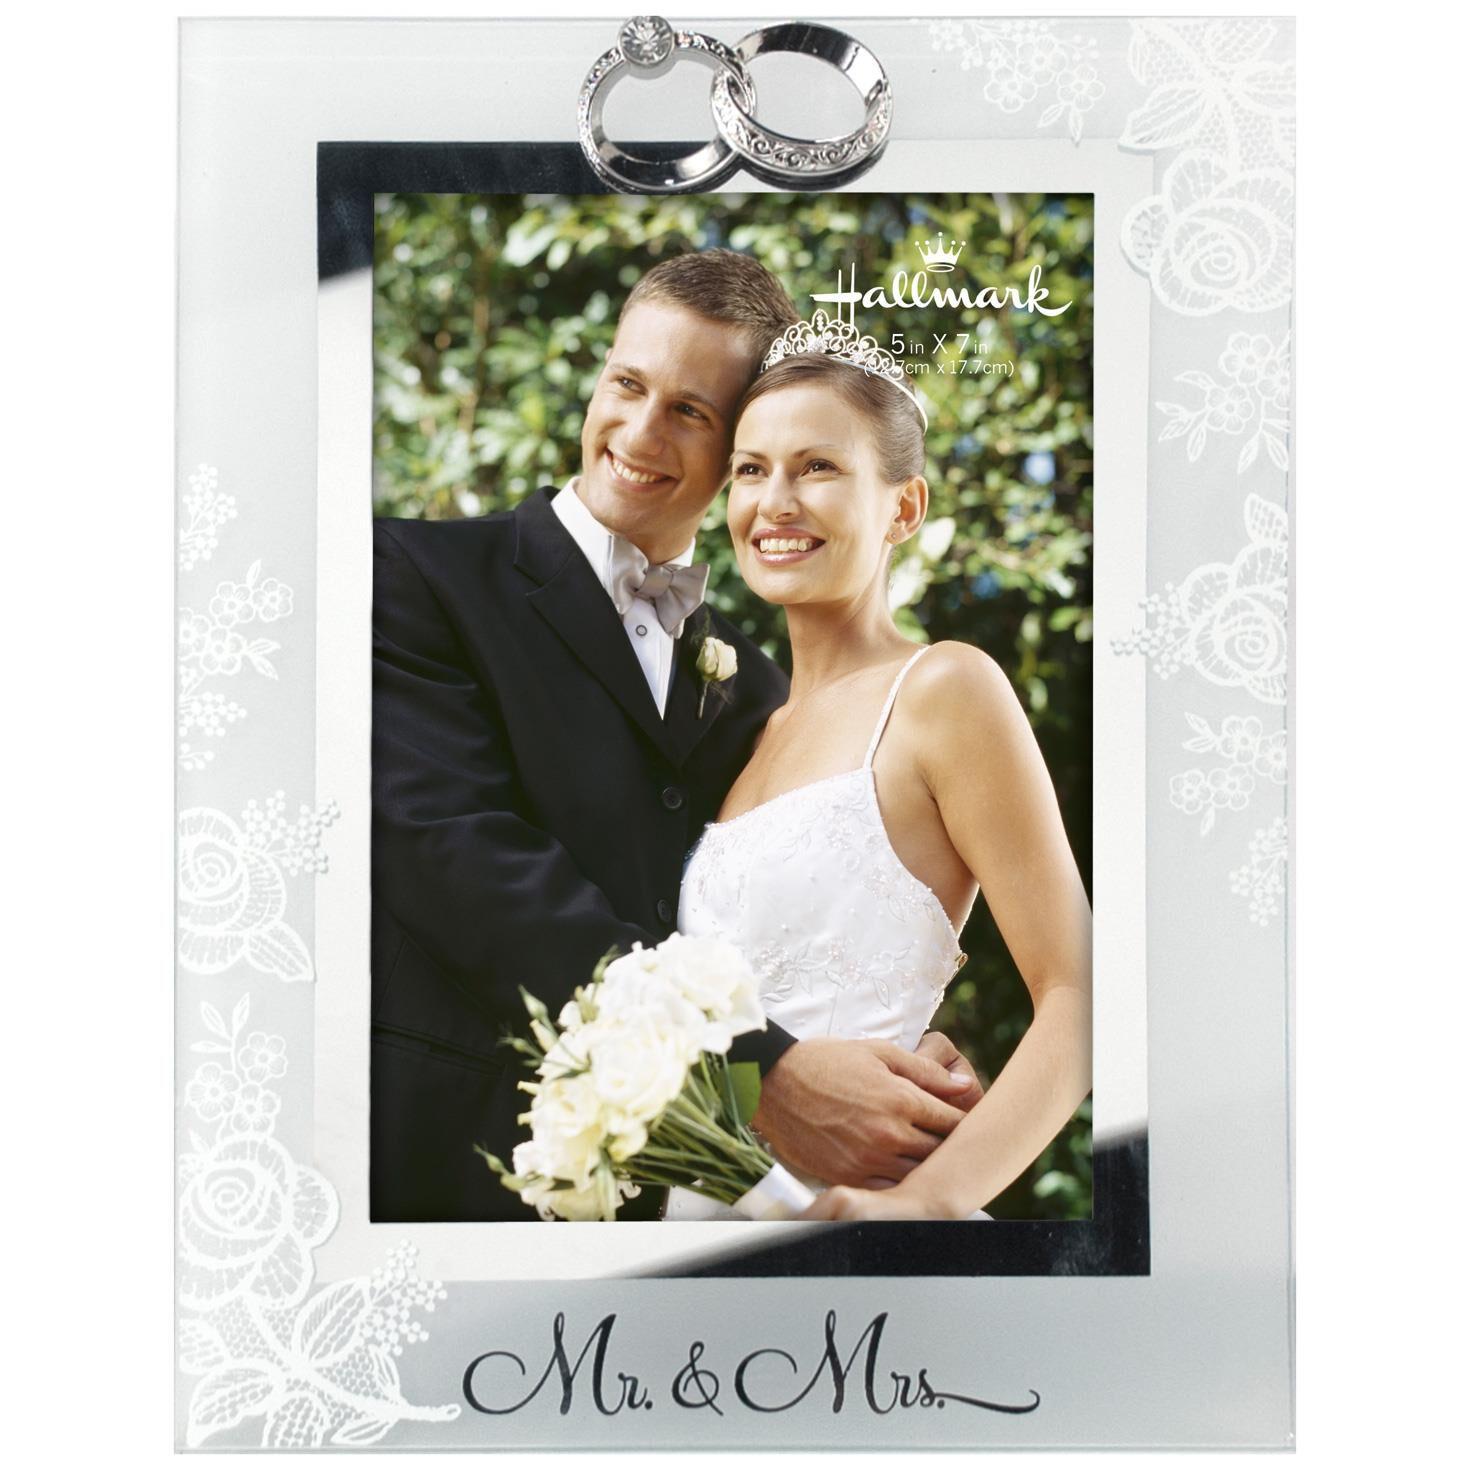 mr and mrs wedding glass photo frame 5x7